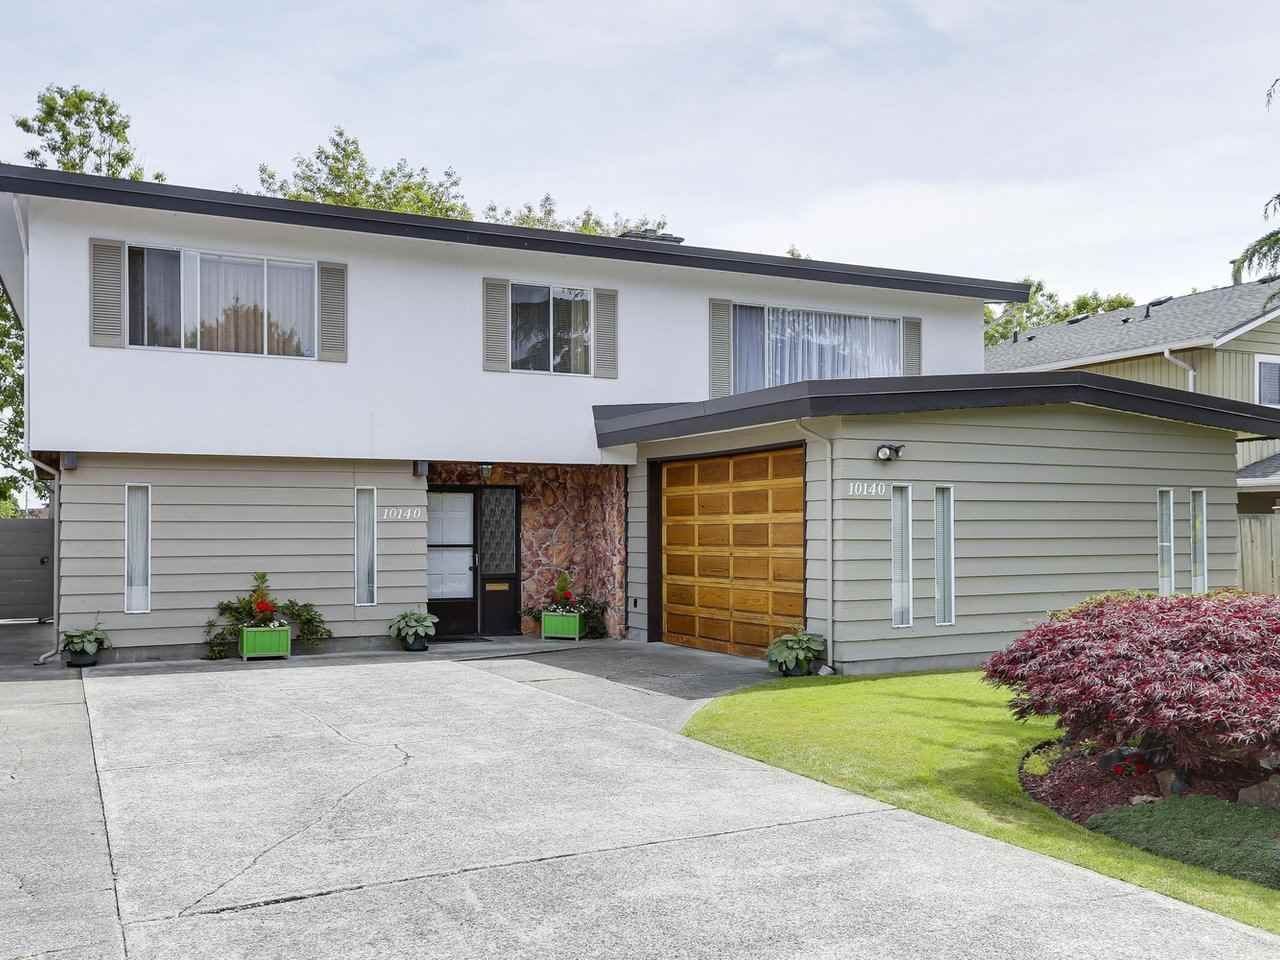 Main Photo: 10140 SPRINGMONT Drive in Richmond: Steveston North House for sale : MLS®# R2175943